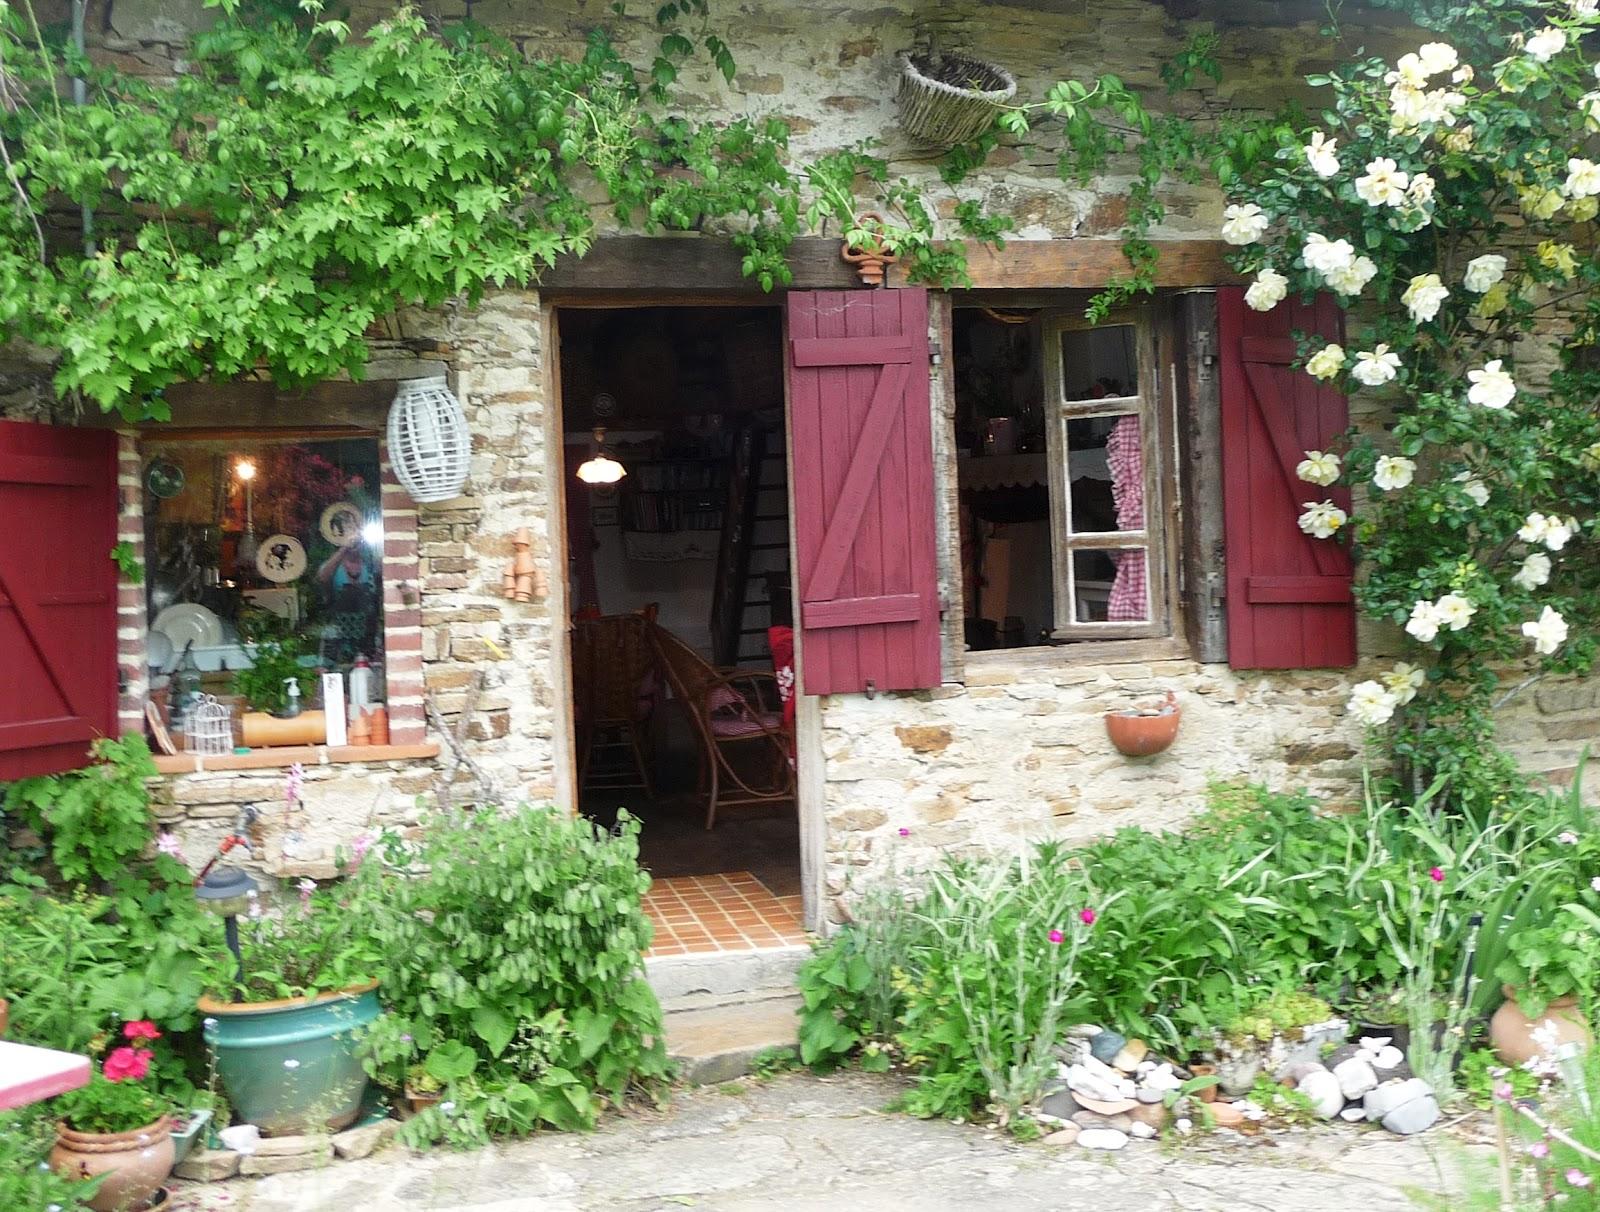 Garden Design Garden Design With French Country Decor On